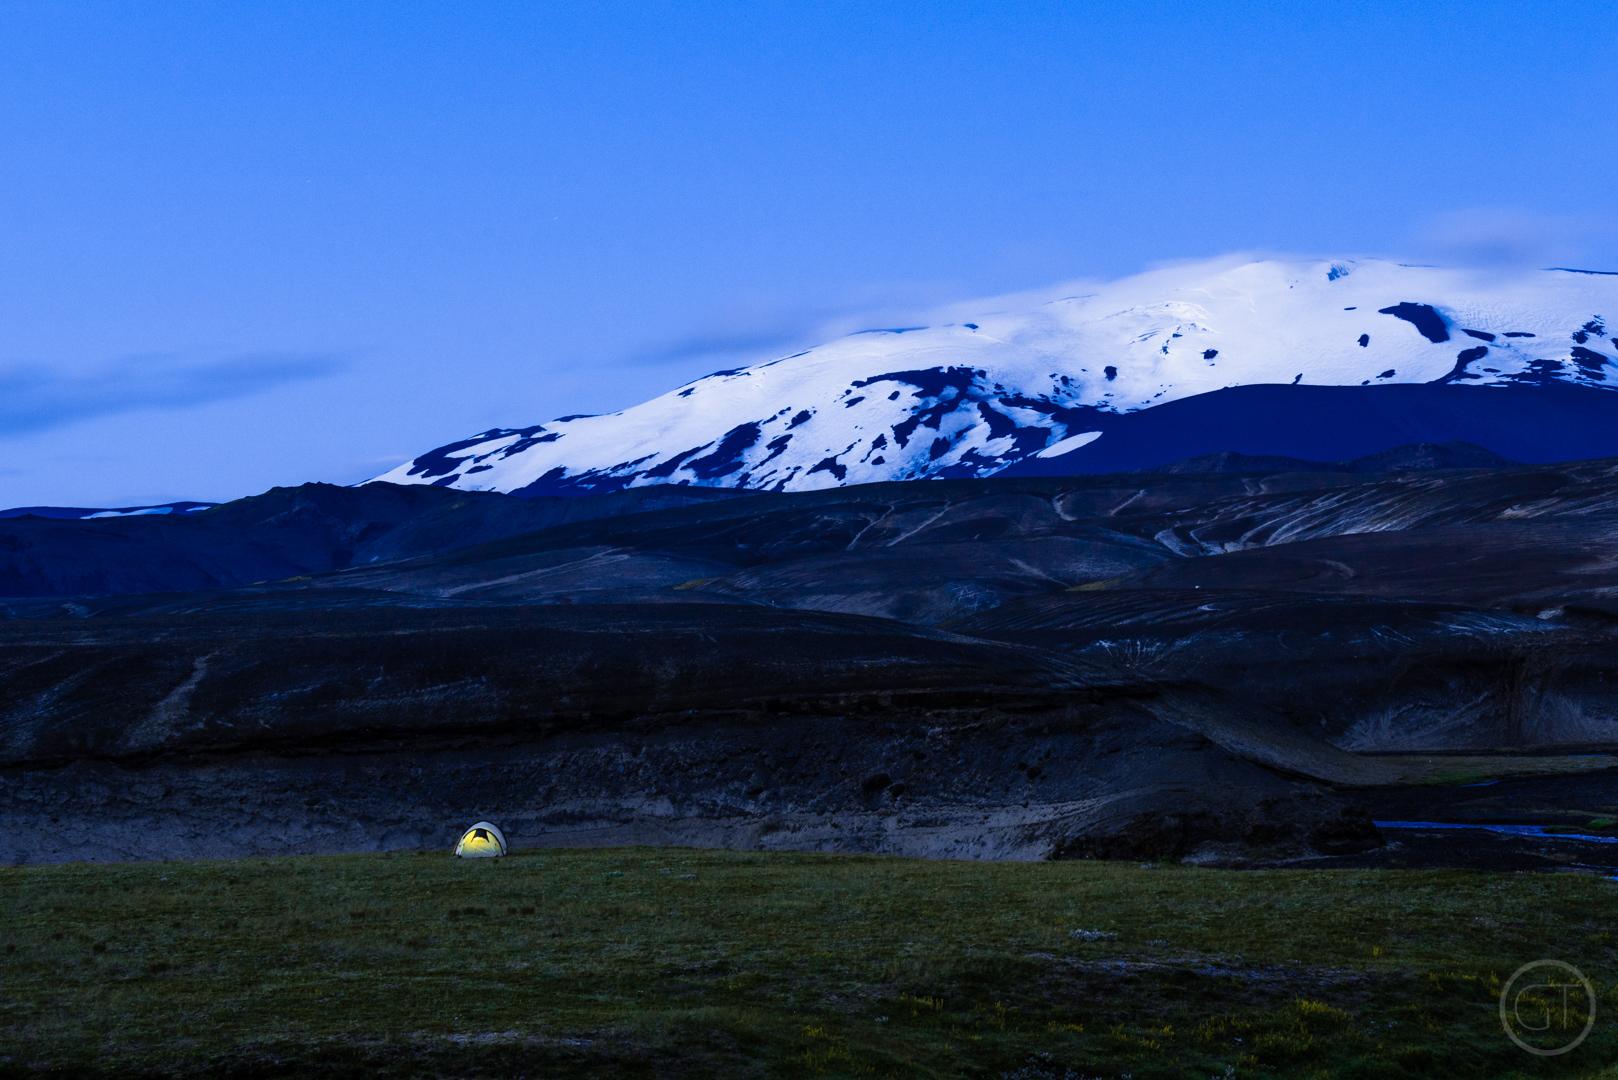 Iceland-gustav-thuesen-photography-landscape-nature-københavn-danmark-adventure-outdoor-lifestyle-12.jpg